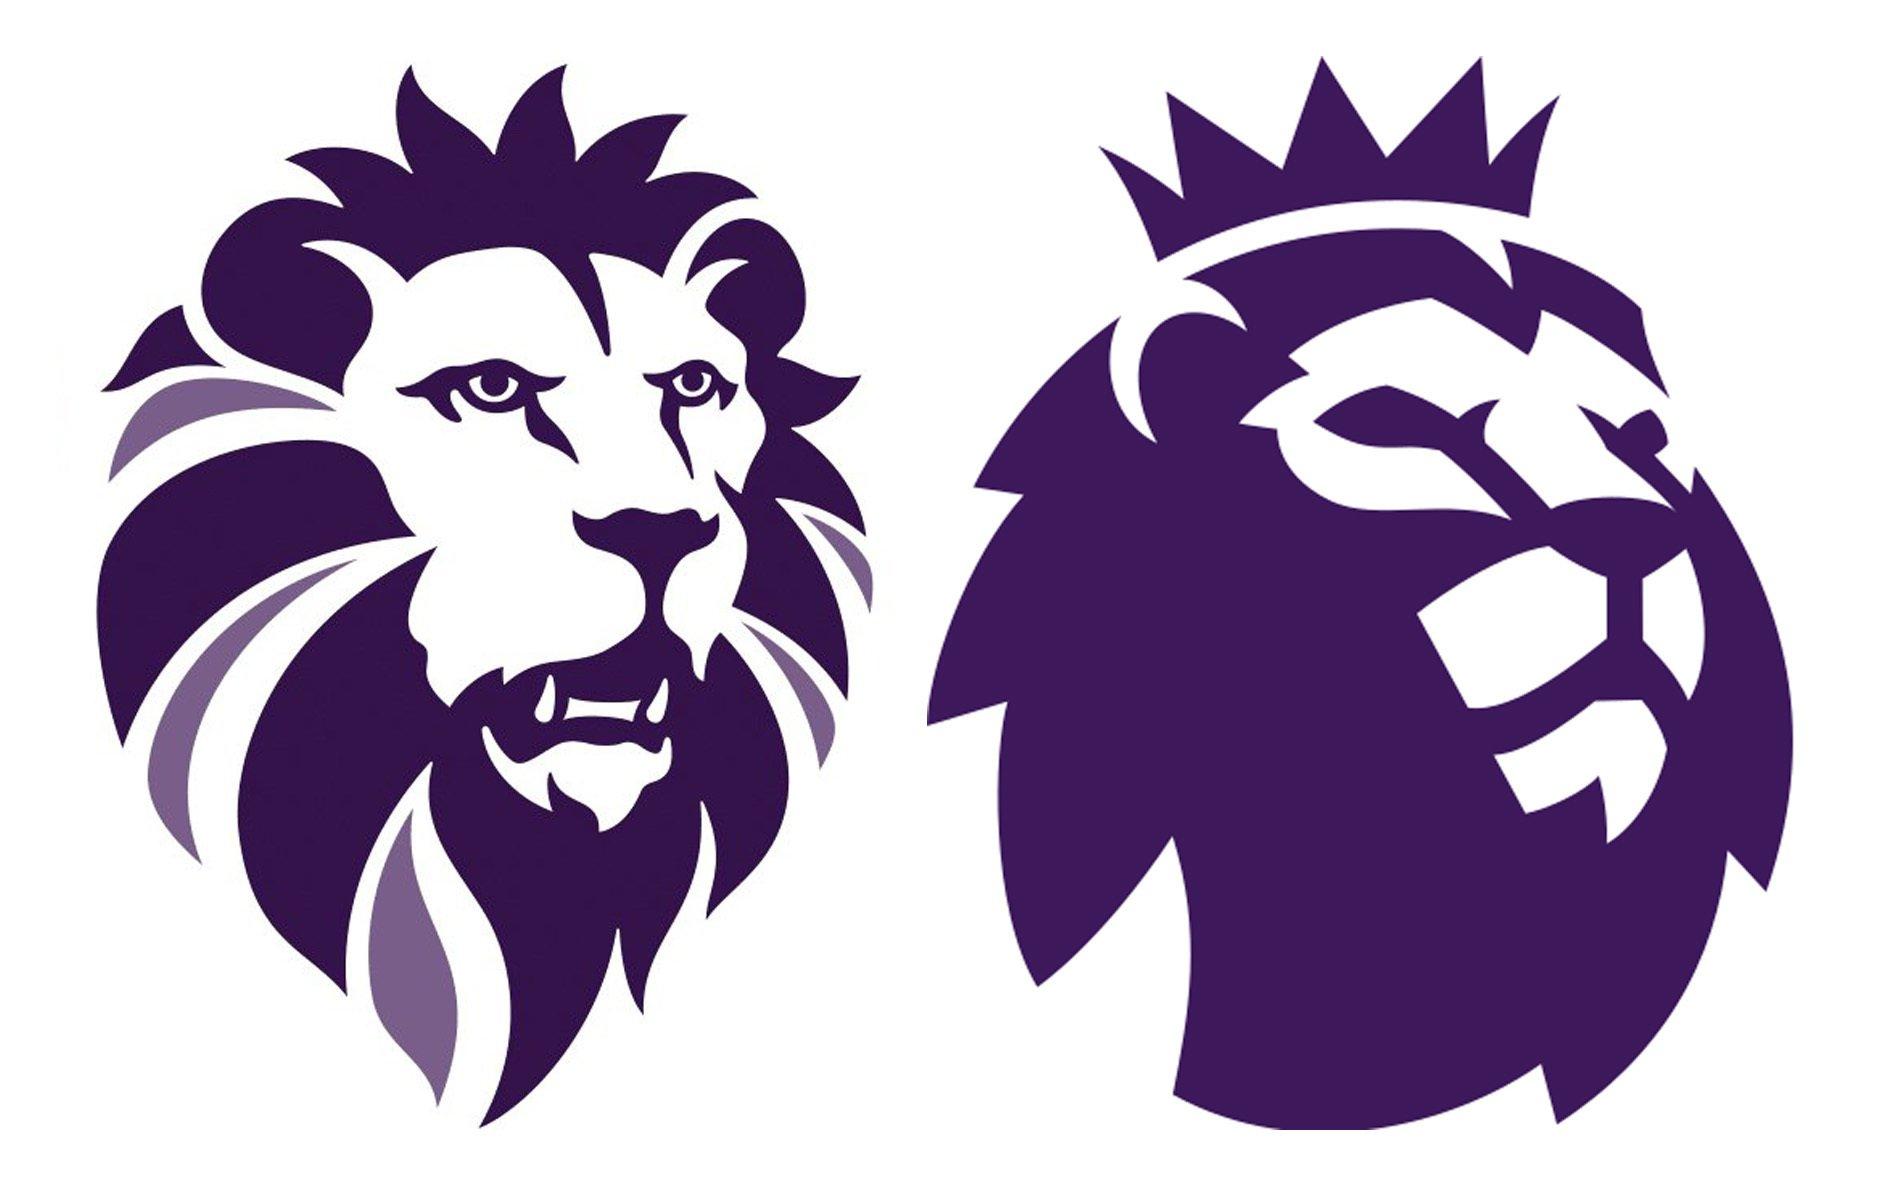 Ukip's new logo looks just like the Premier League lion